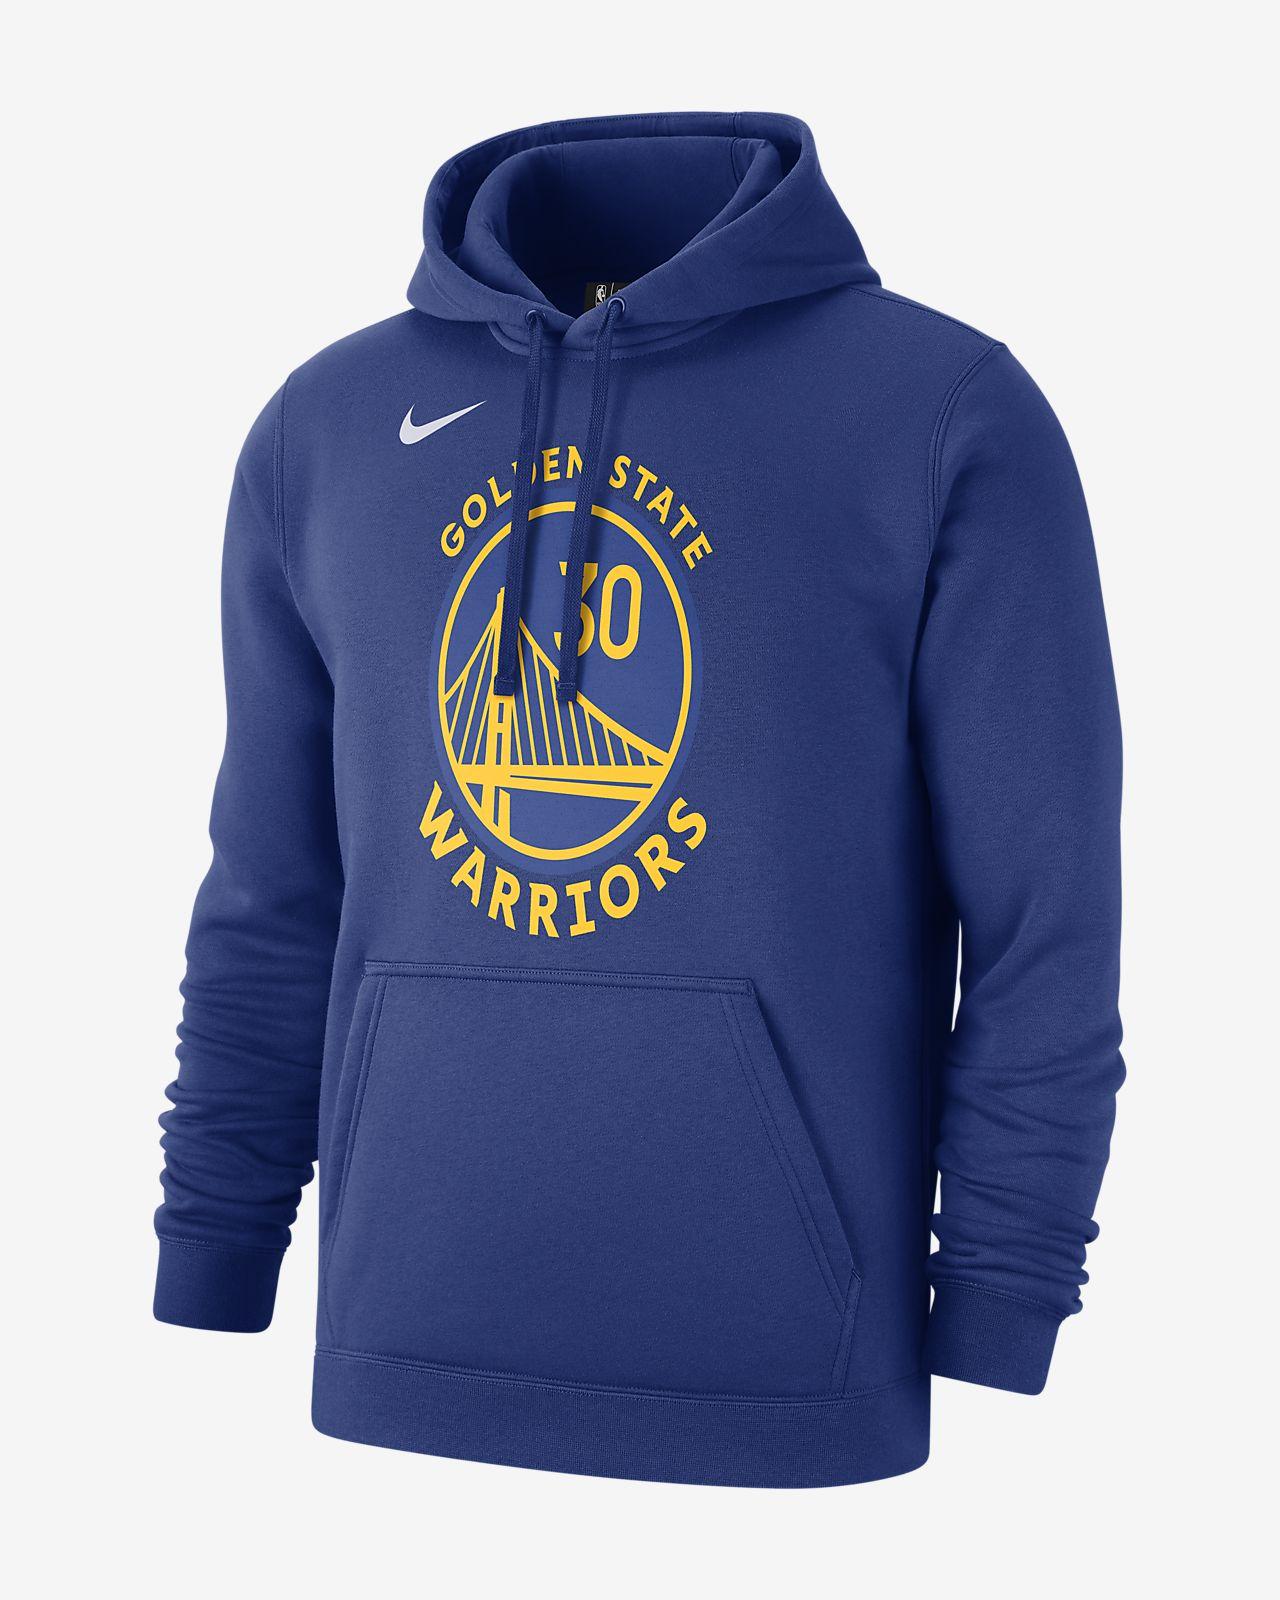 Stephen Curry Golden State Warriors Nike 男款 NBA 連帽上衣